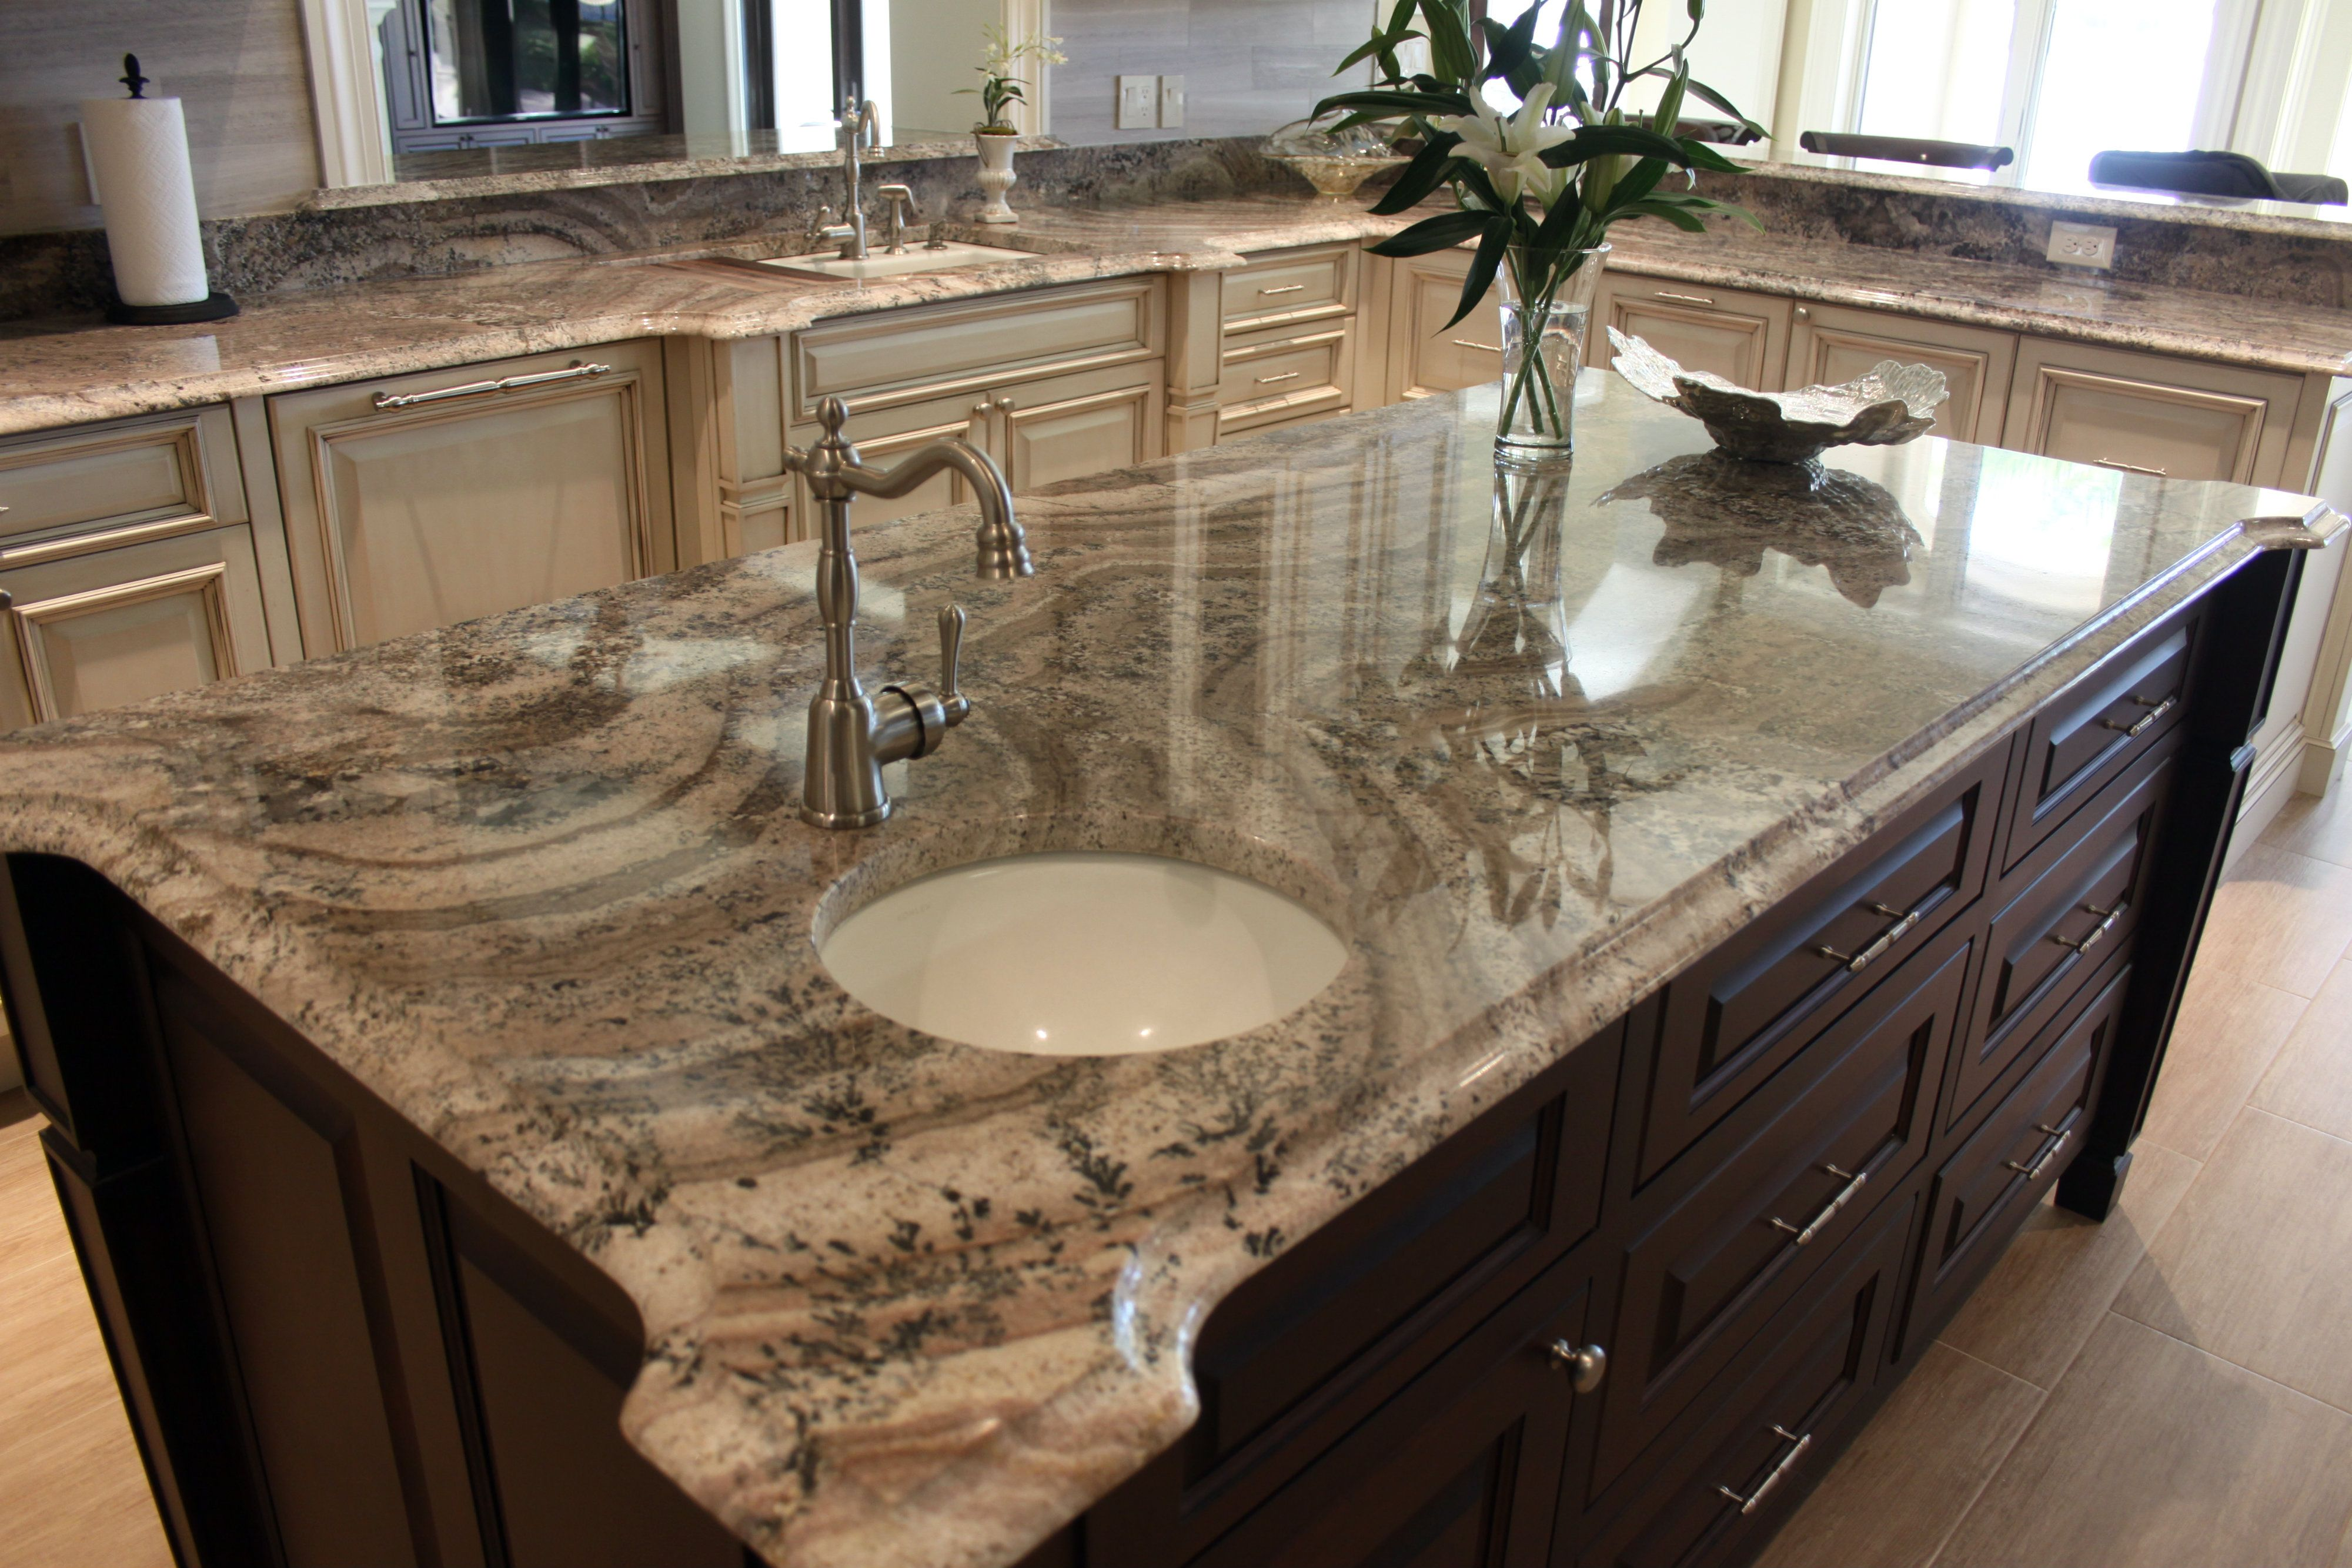 Juperana Peragahmino Granite Kitchen Island #SuperiorGranite #Granite # GraniteCountertops #Pensacola #Florida #